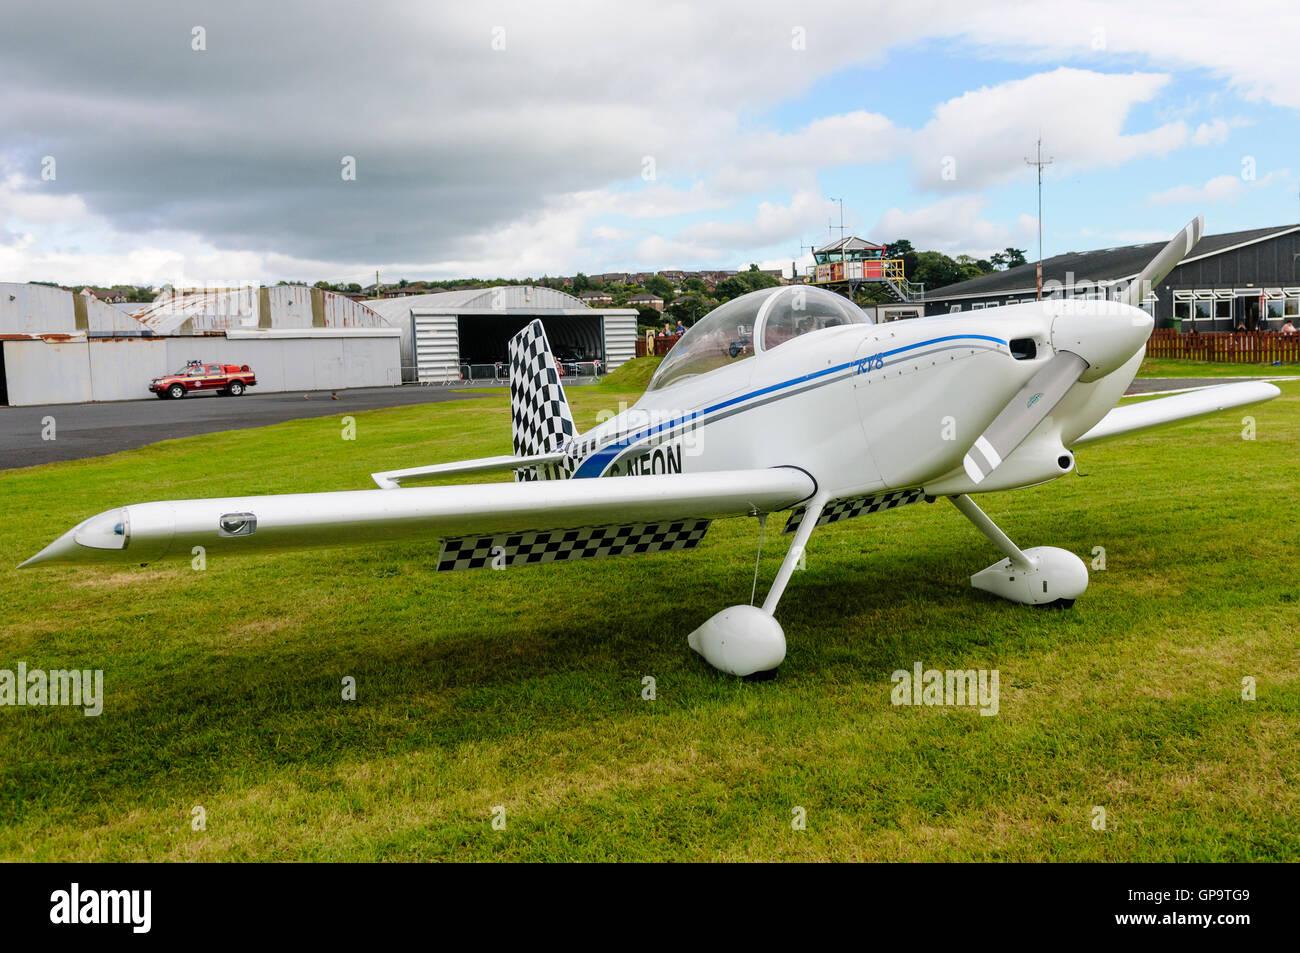 G-NFON Vans RV-8 aircraft - Stock Image